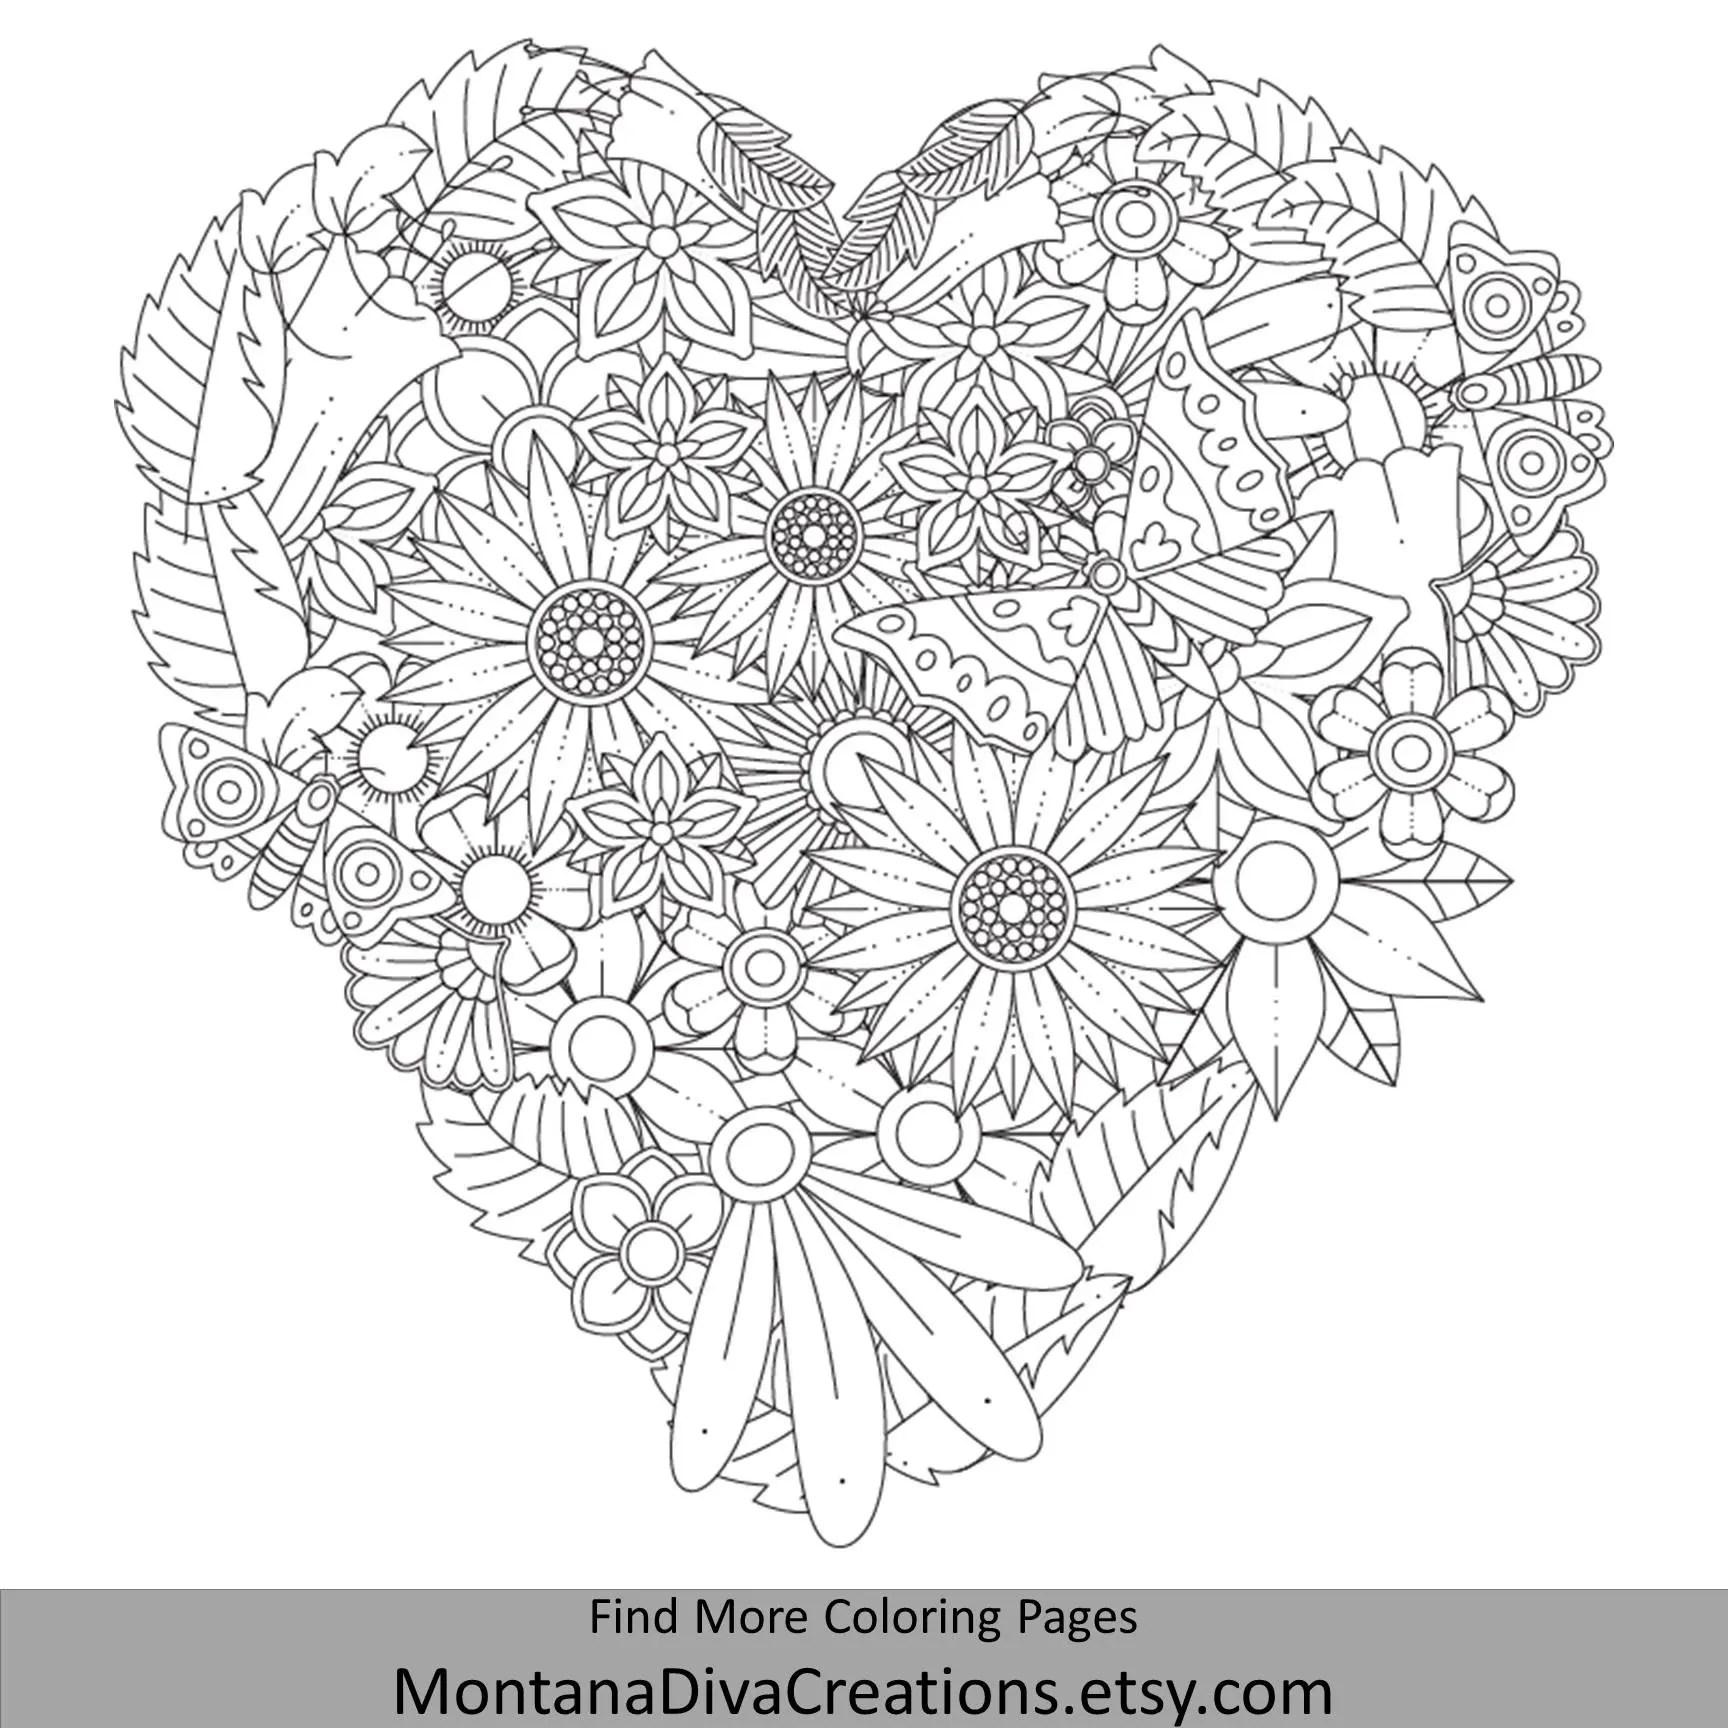 Autumn Mandala Adult Coloring Book 20 Instant Downloadable